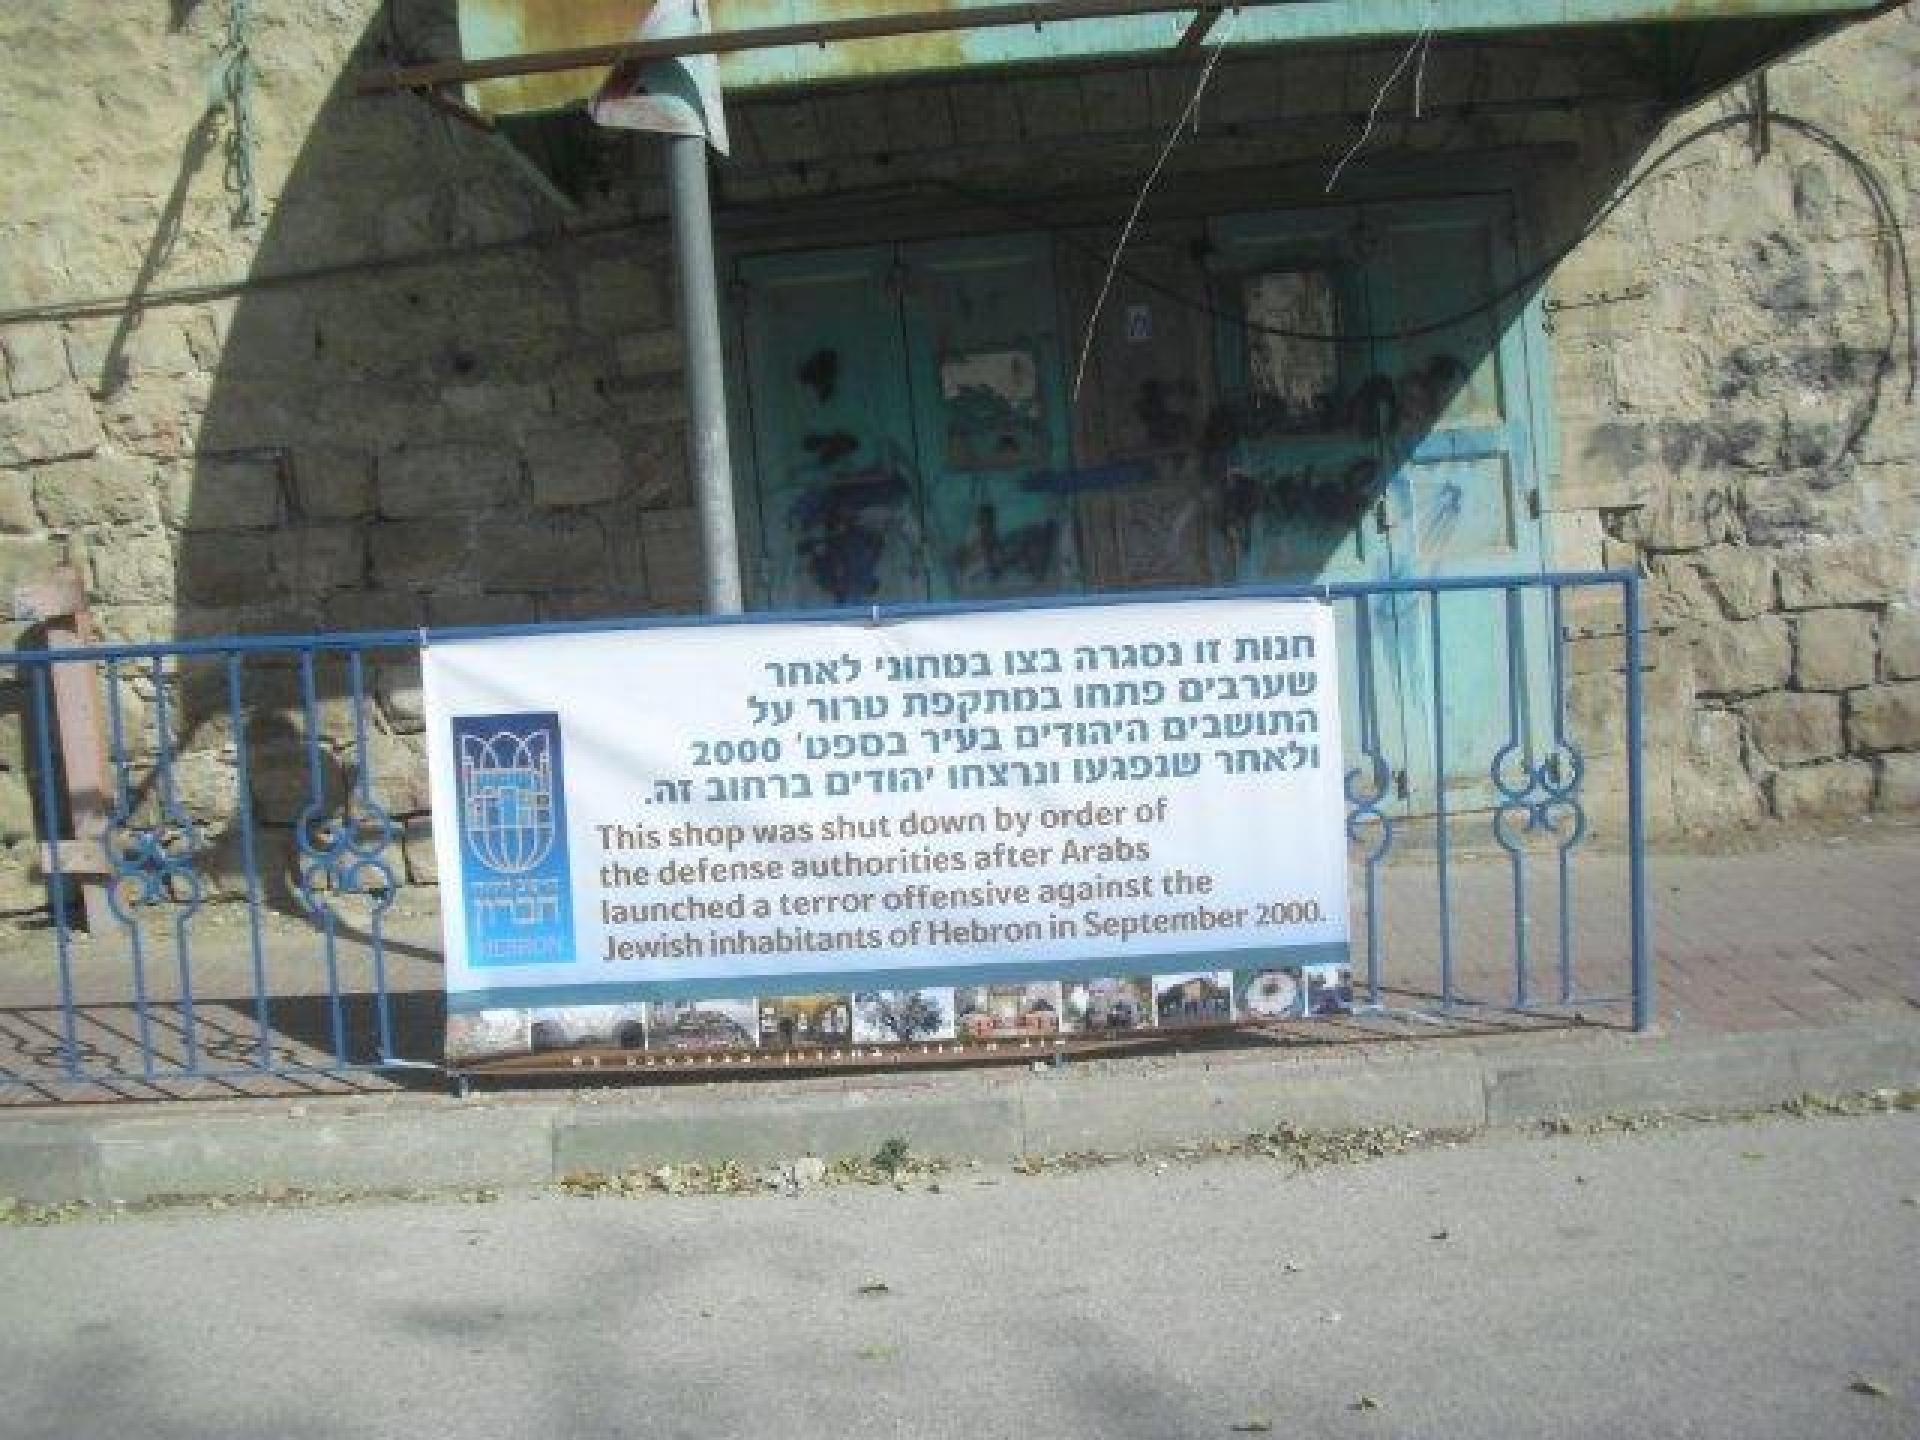 Hebron 19.12.11